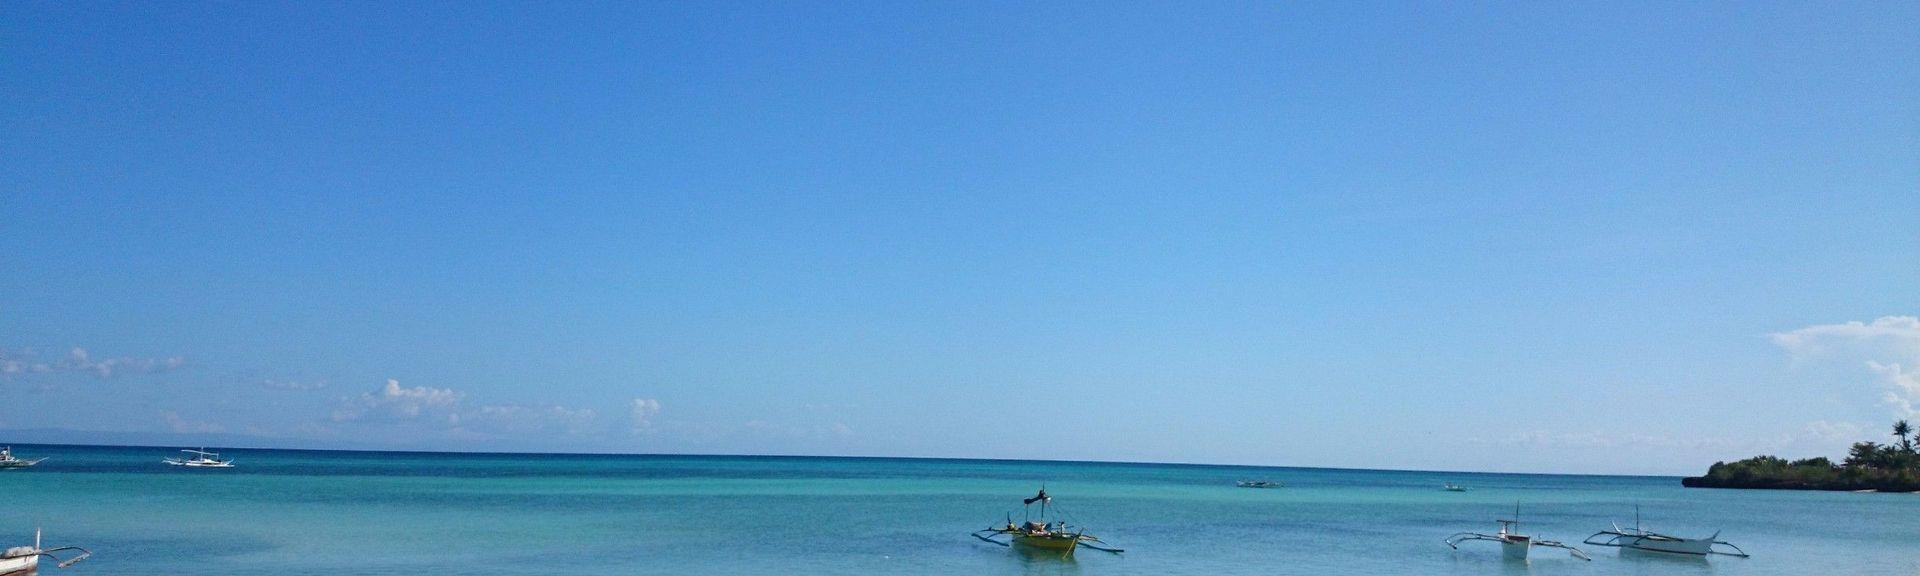 Bantayan Island, Philippines